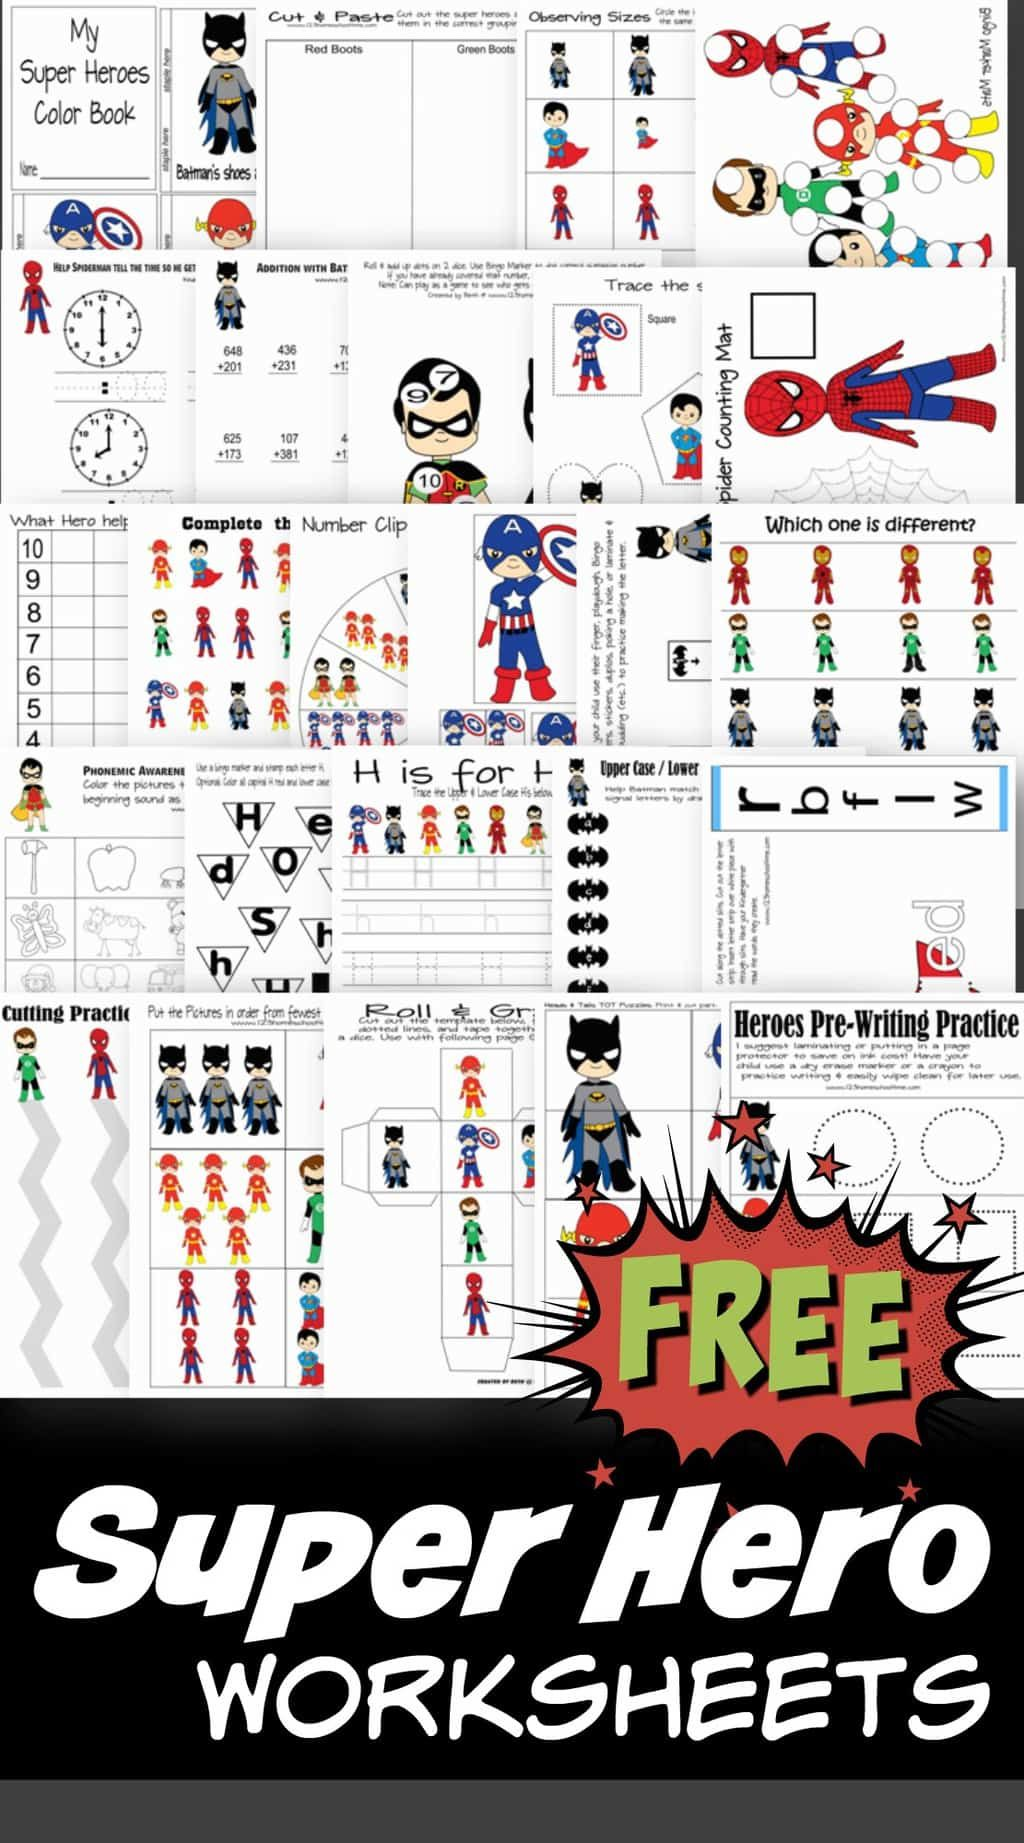 Predownload: Free Superhero Worksheets Free Preschool Printables Superhero Preschool Preschool Printables [ 1843 x 1024 Pixel ]